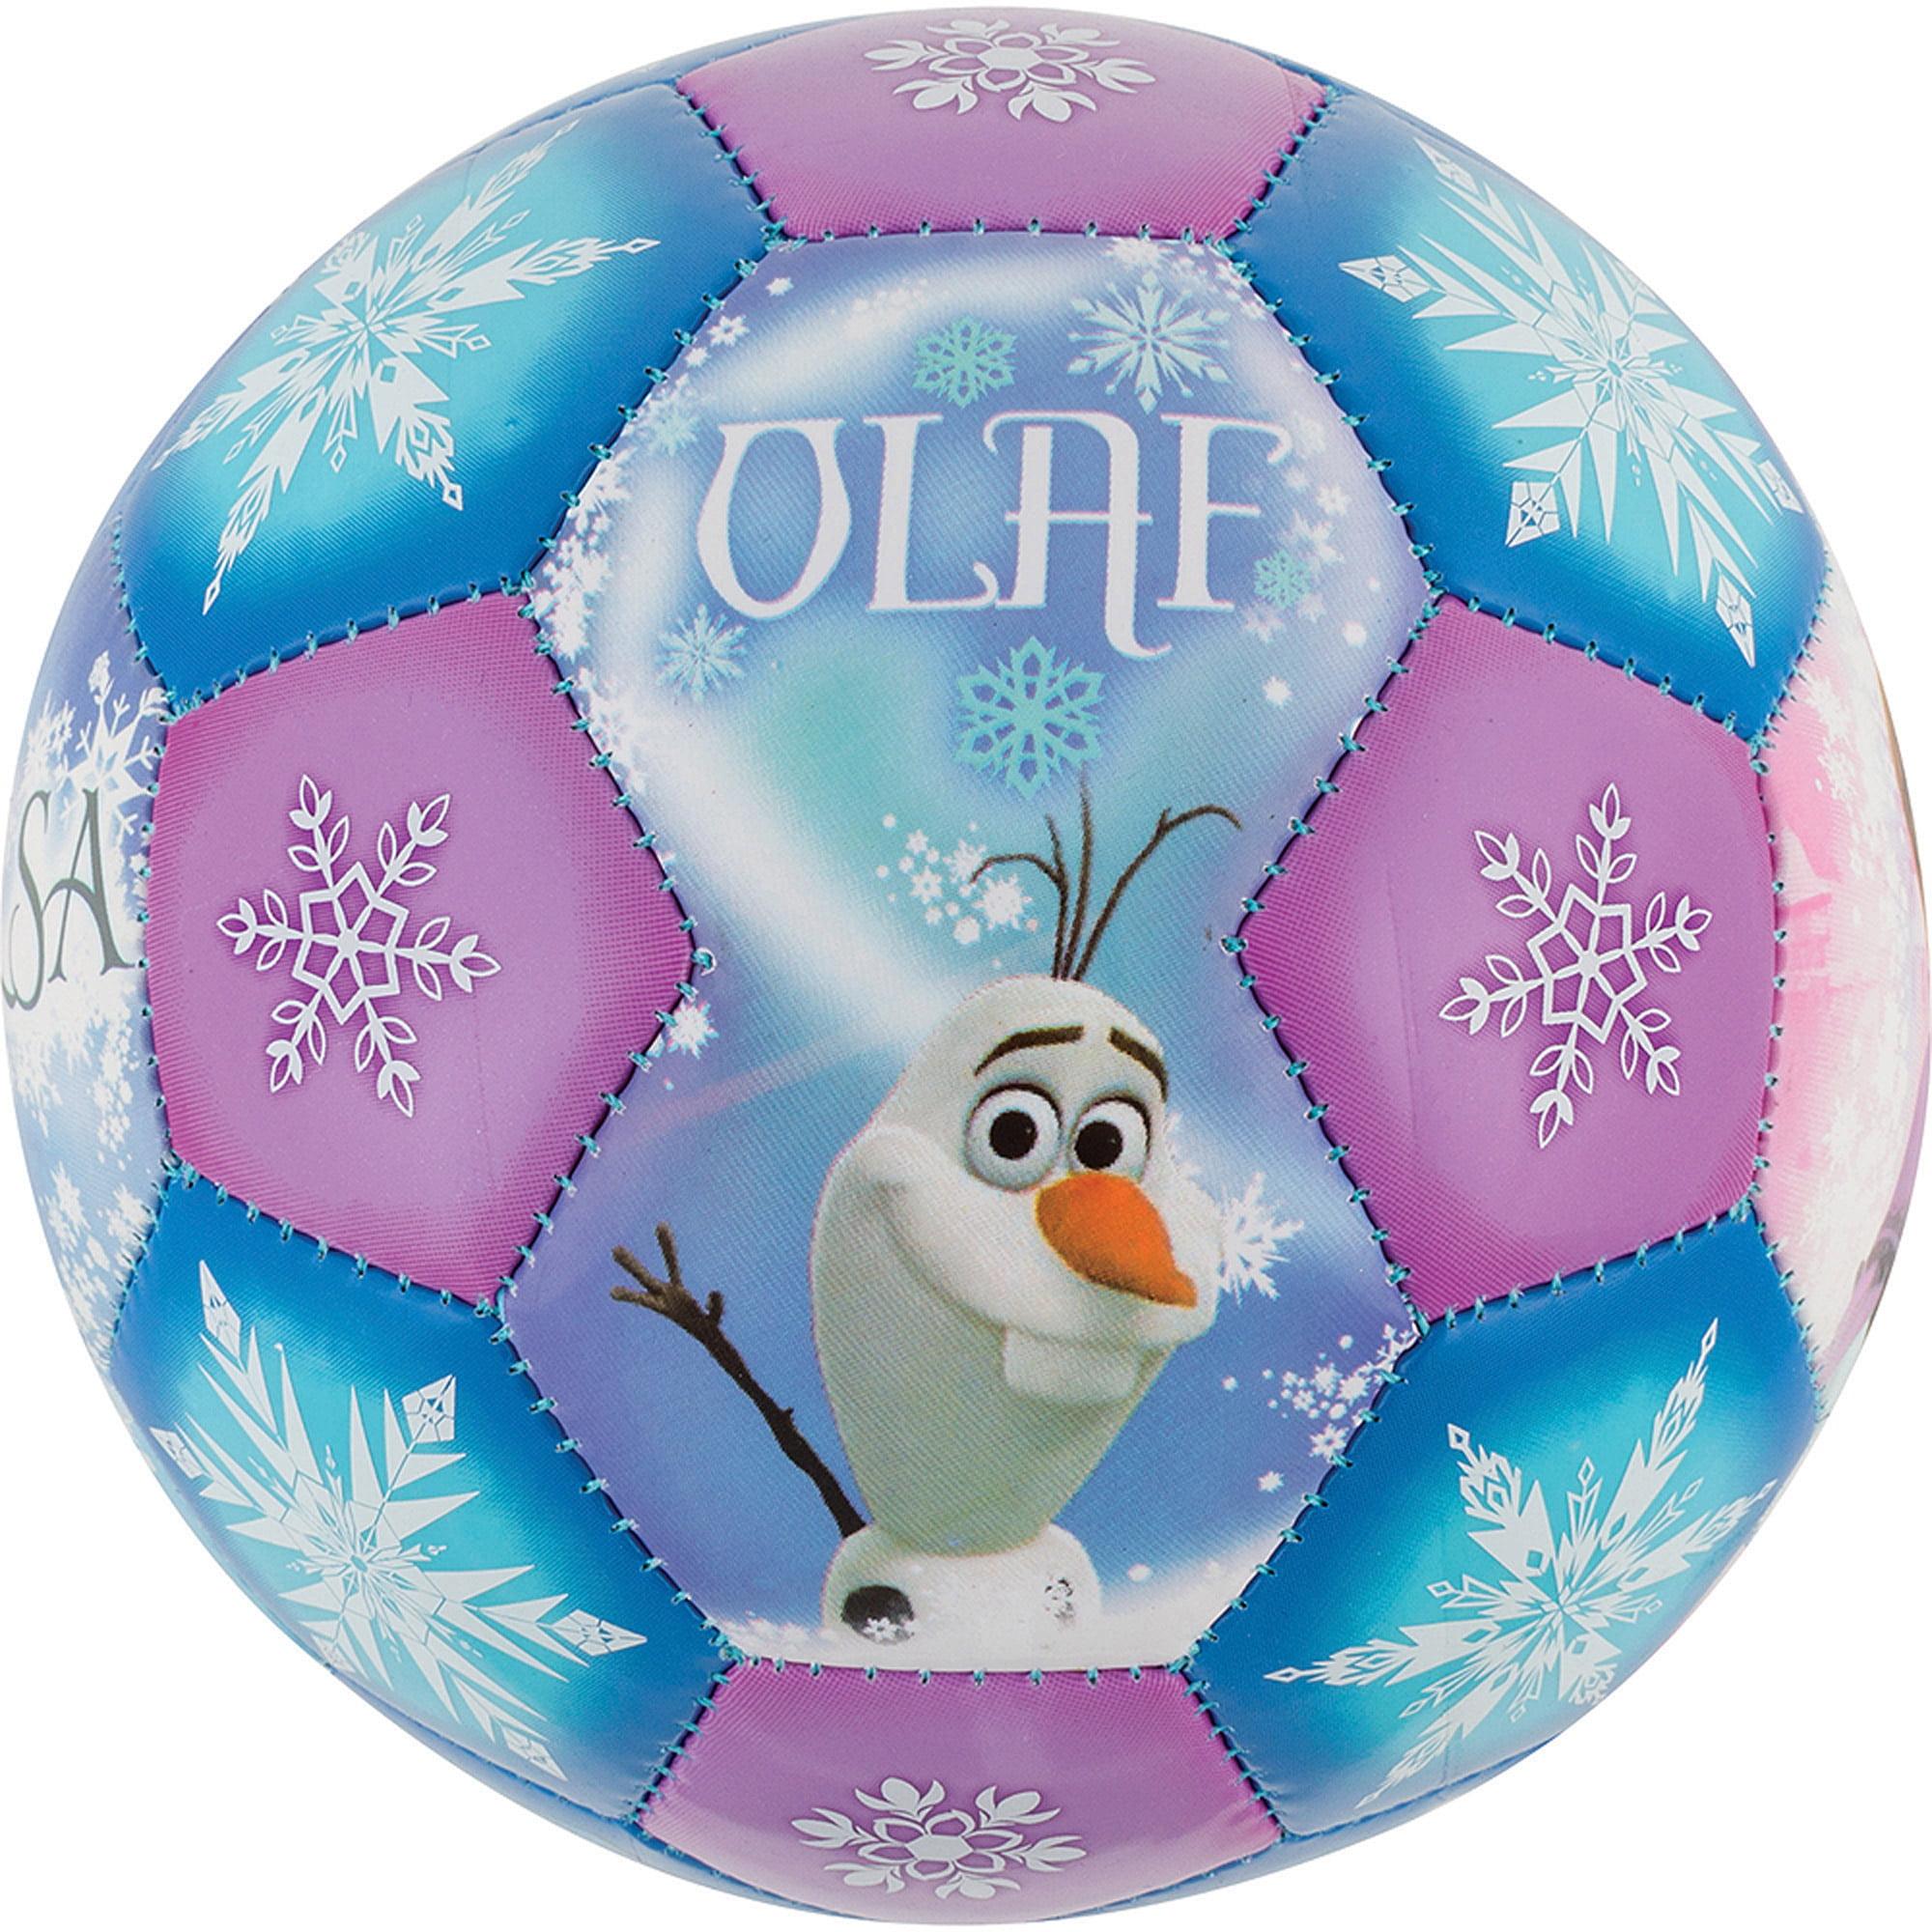 Franklin Sports Disney Frozen Size 3 Soft Foam Air Tech Soccer Ball by Franklin Sports